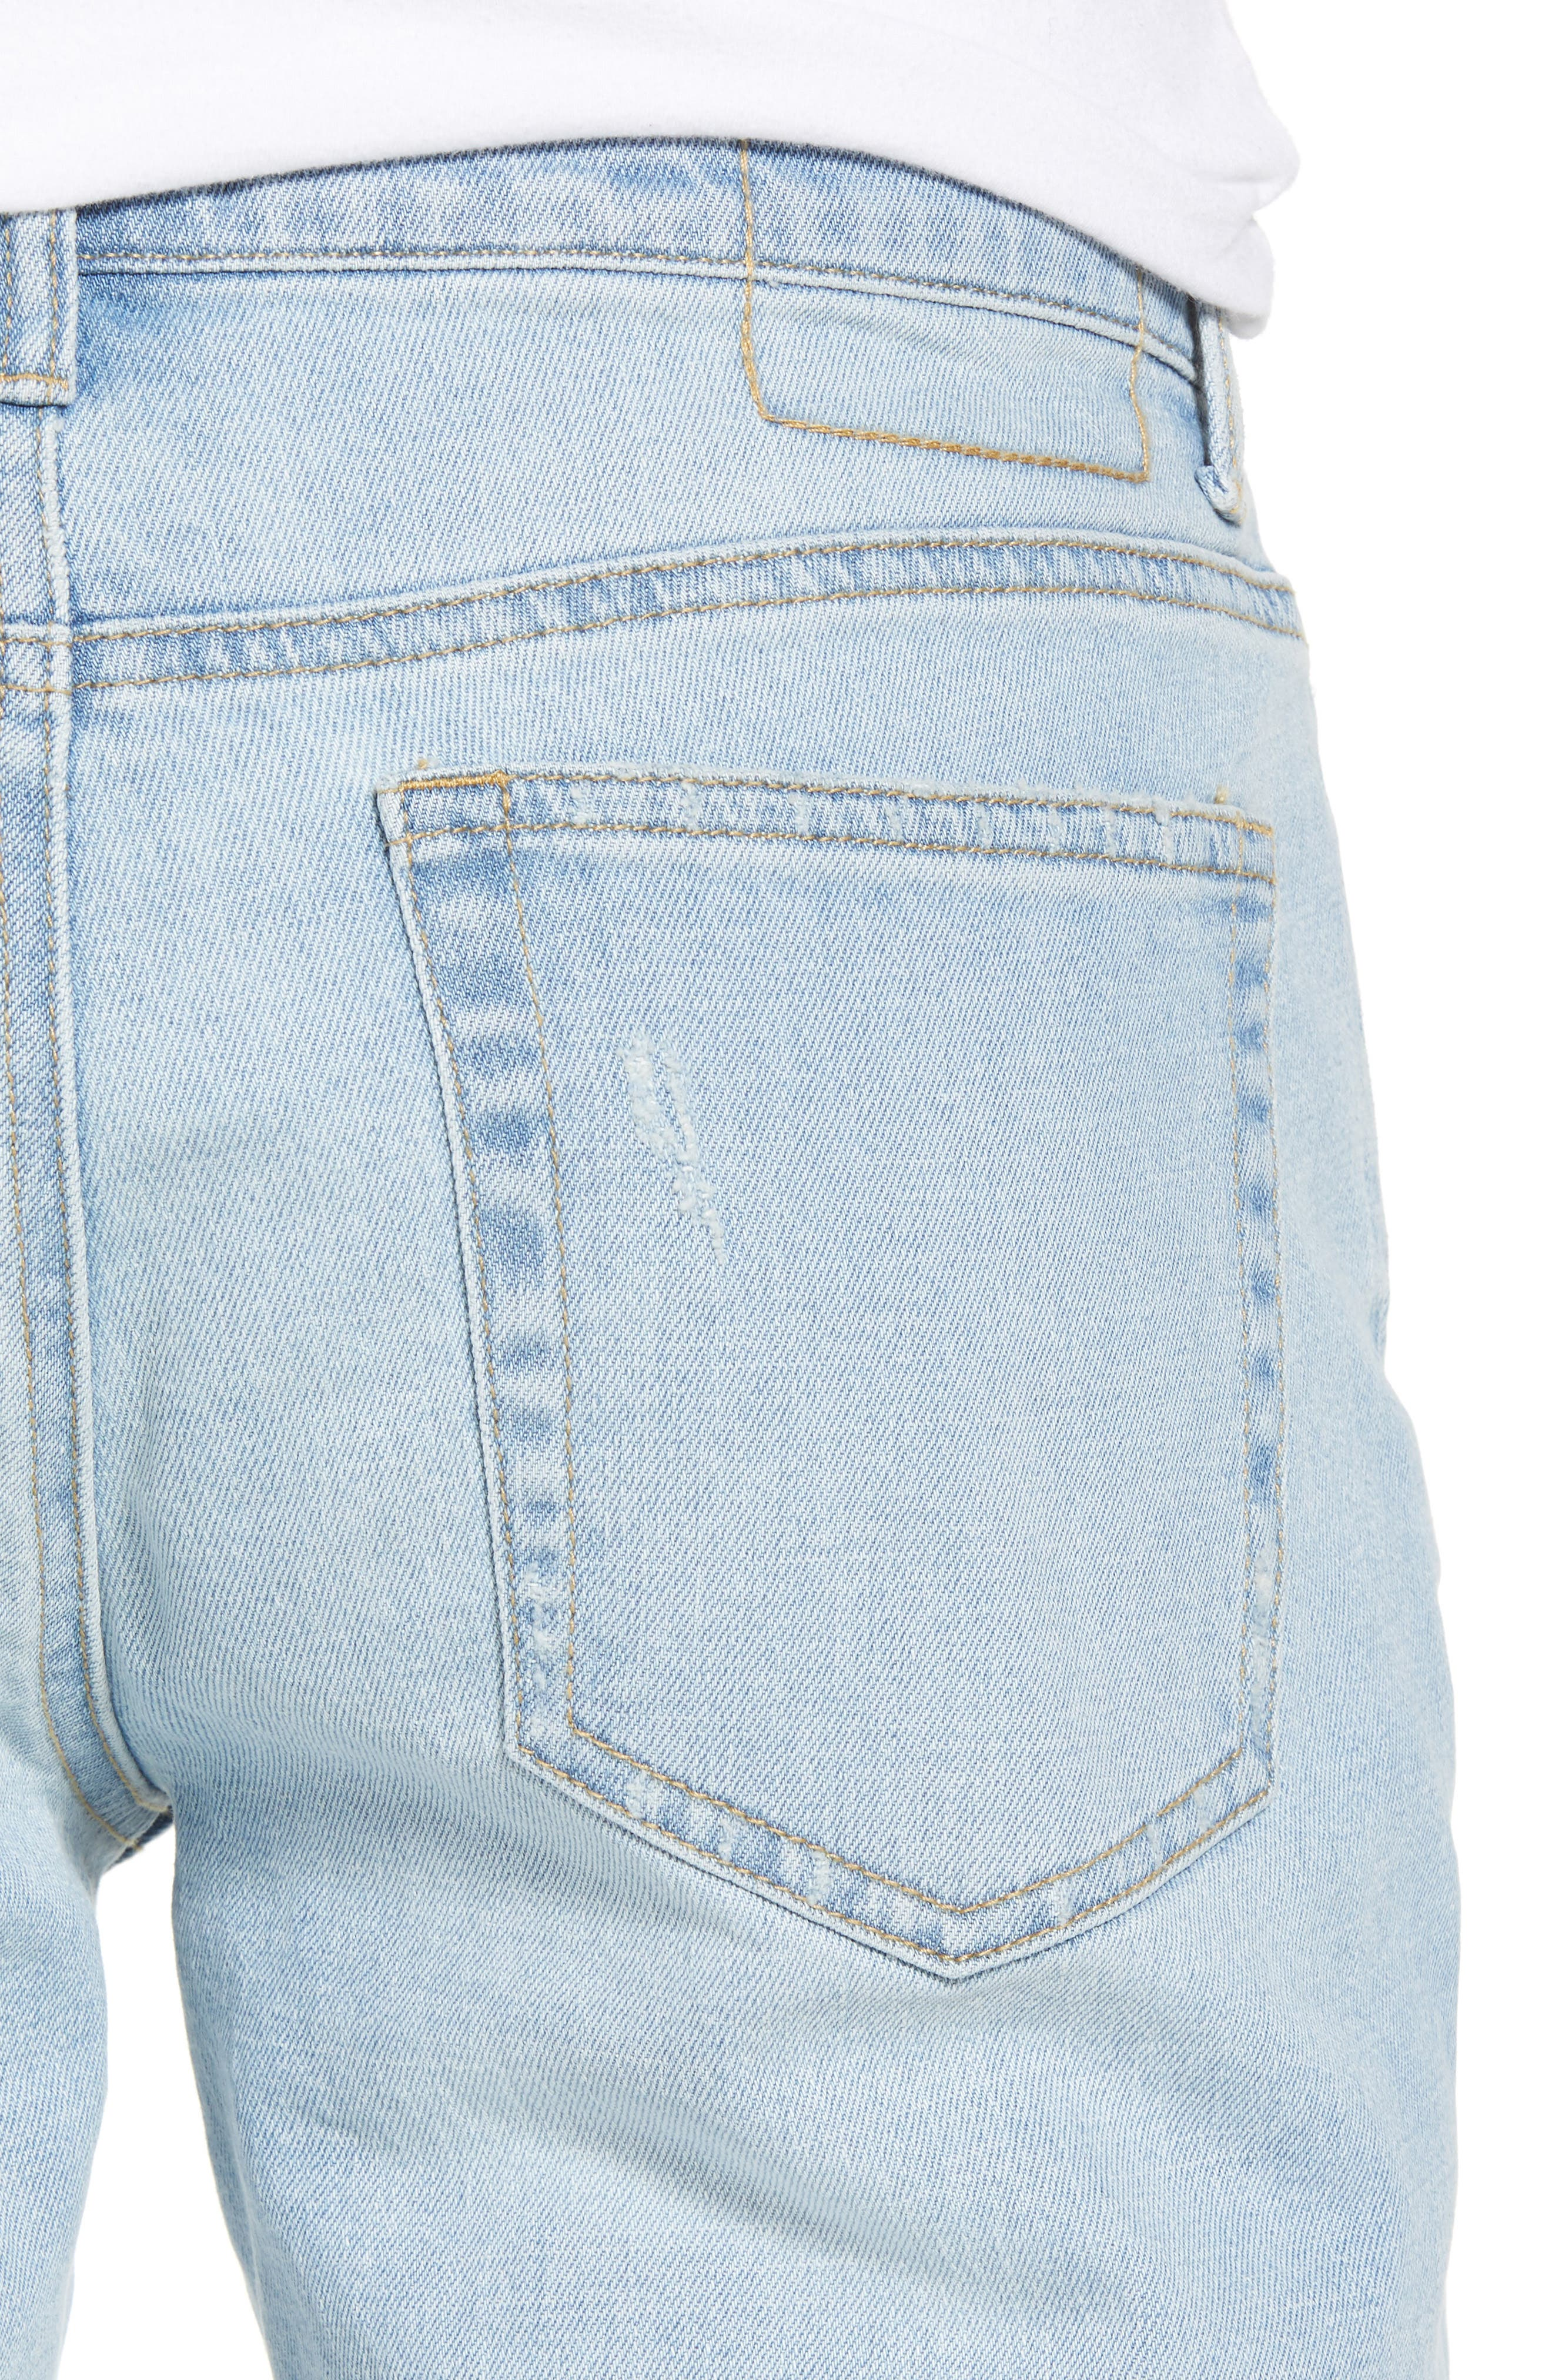 Ripped Skinny Jeans,                             Alternate thumbnail 4, color,                             BLUE CORGAN WASH